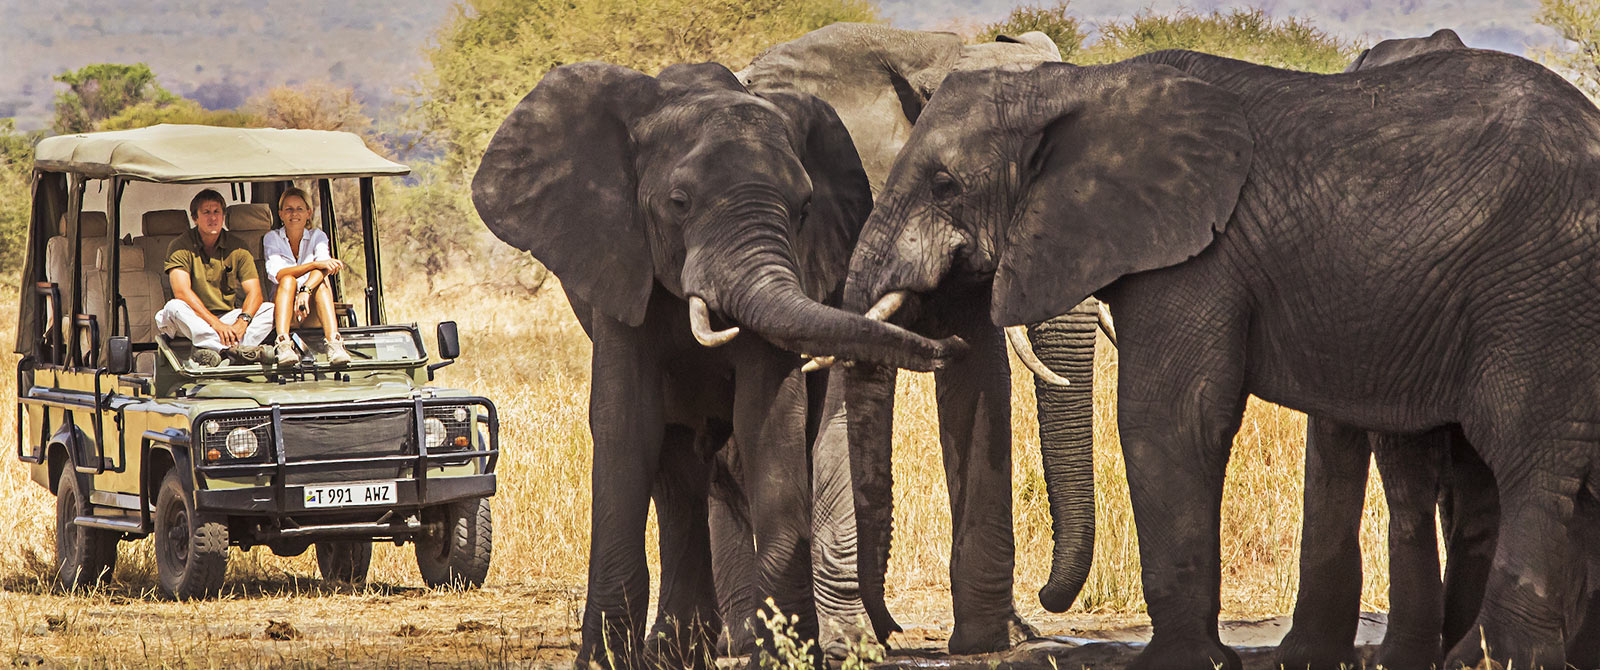 Tusker Elephants on Tarangire Game Drive - Little Chem Chem - Tanzania Highlights: Tarangire, Ngorongoro, and Serengeti Safari